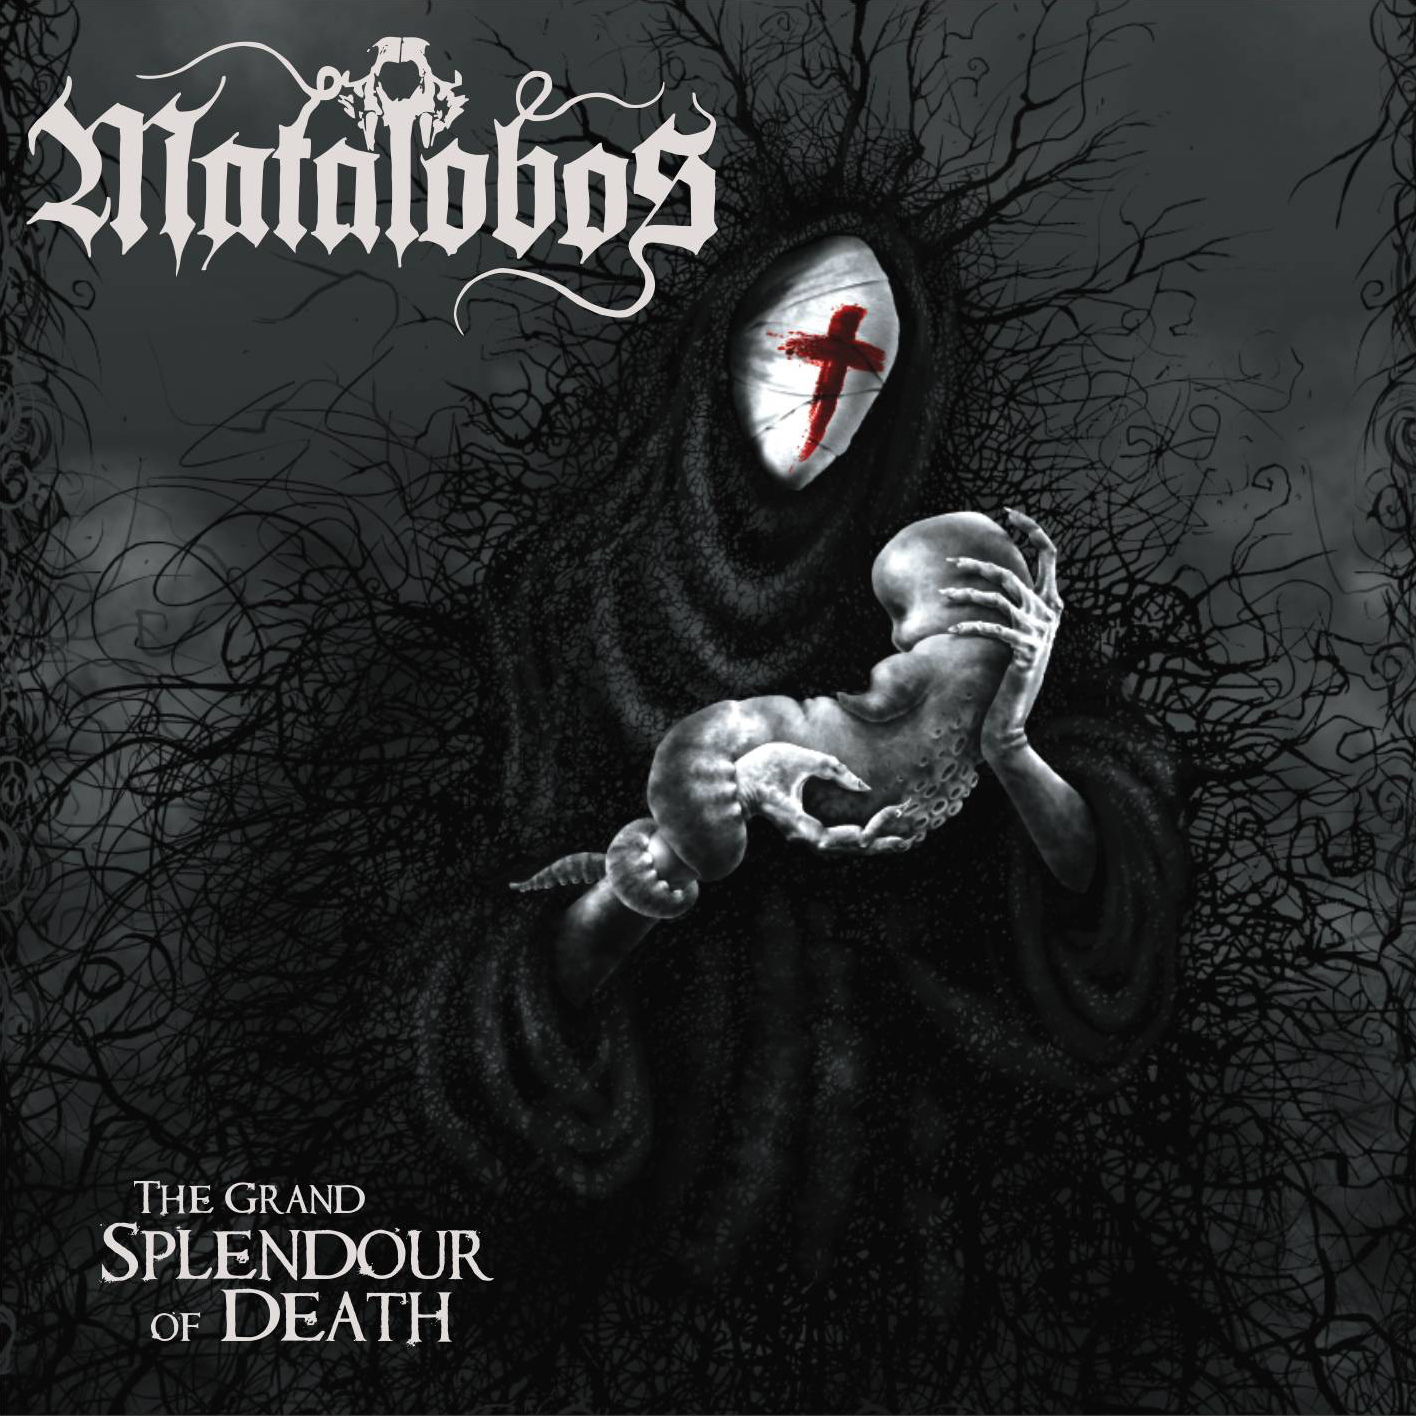 Matalobos - The Grand Splendour of Death